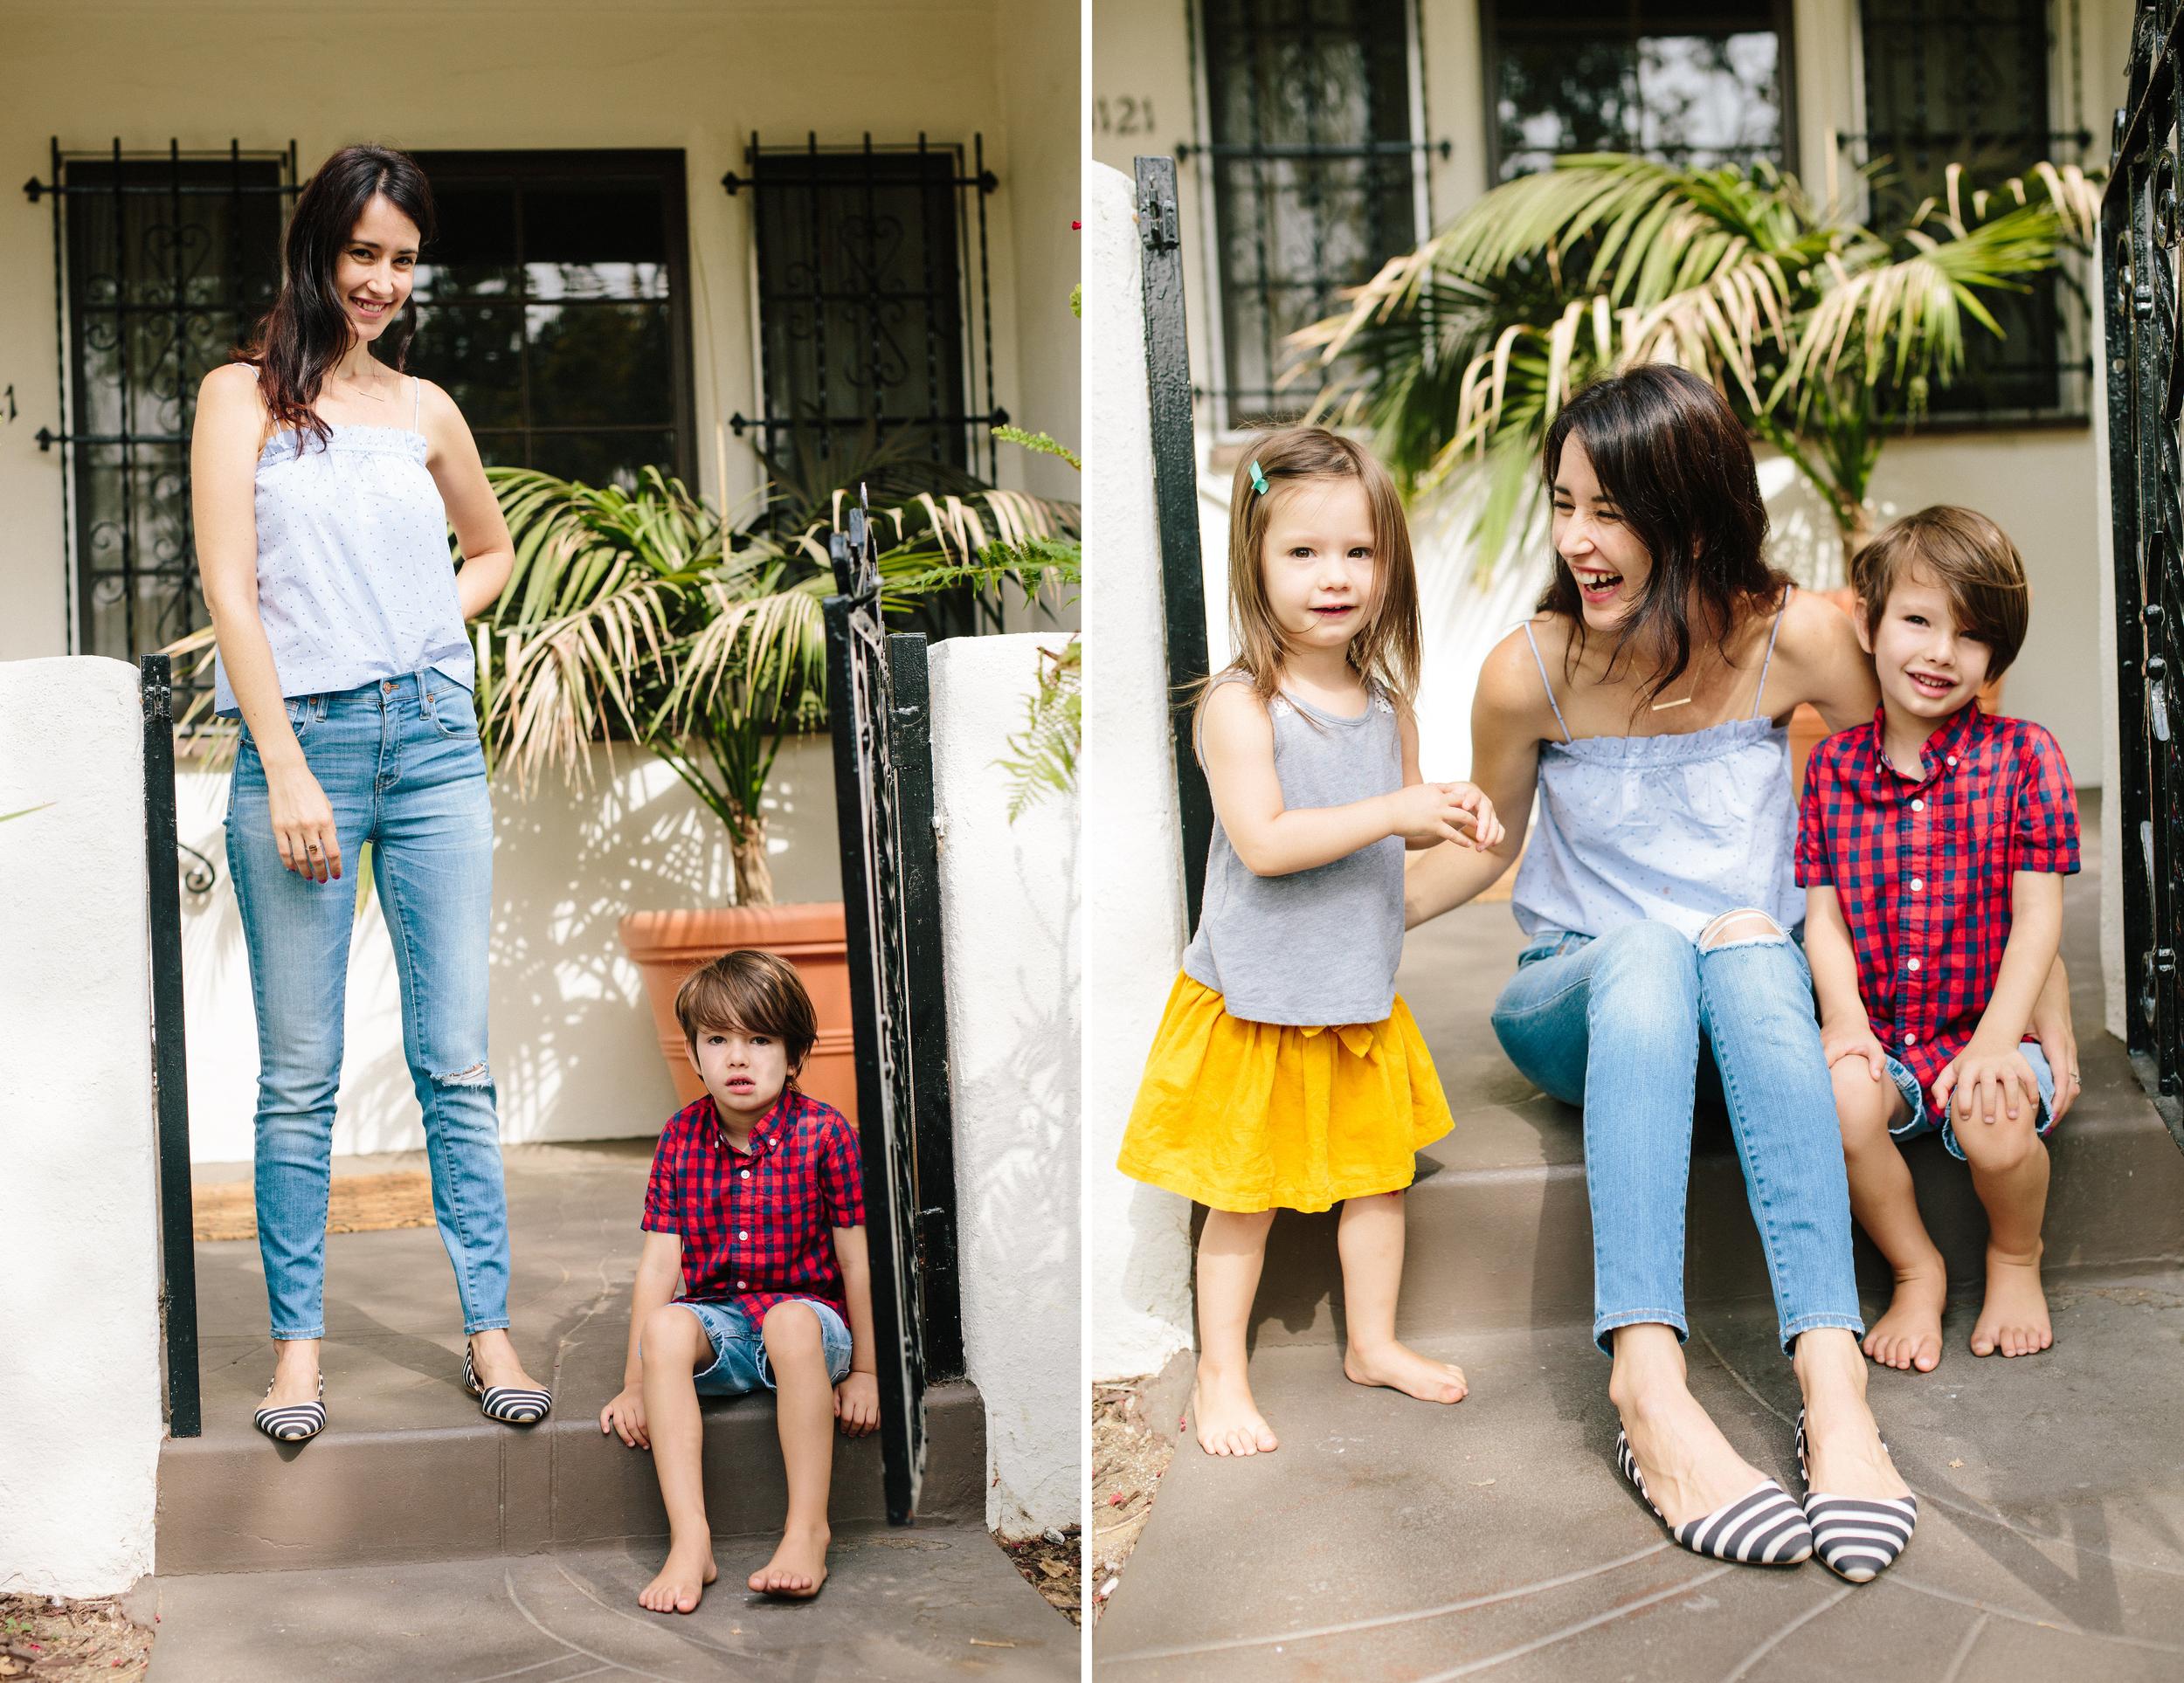 los-angeles-lifestyle-family-child-kid-baby-photographer_7.jpg